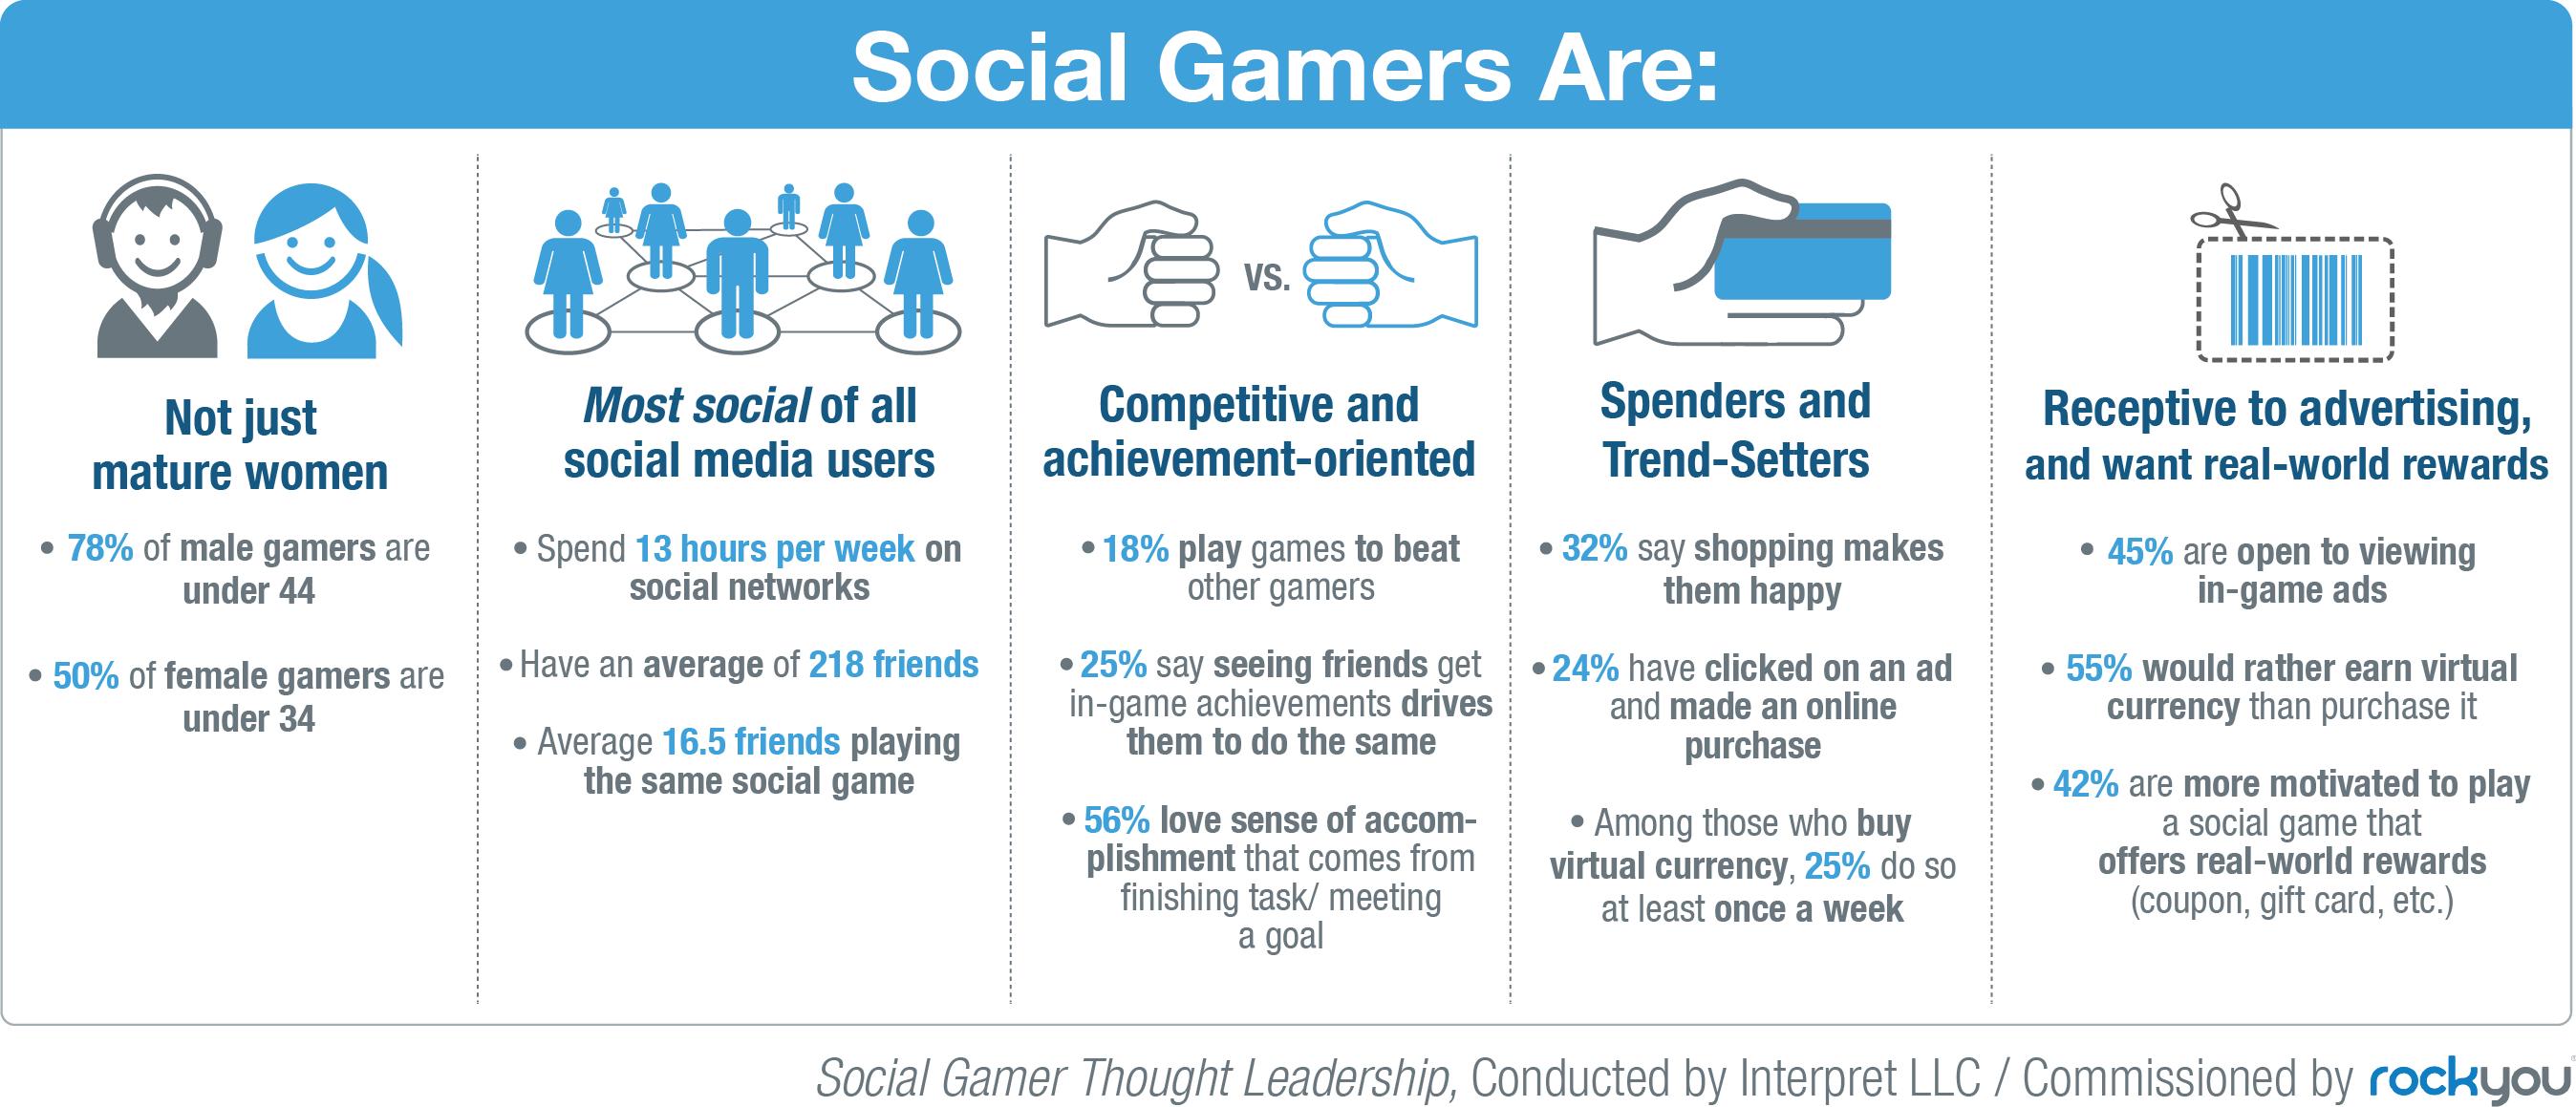 Perfil de los social gamers